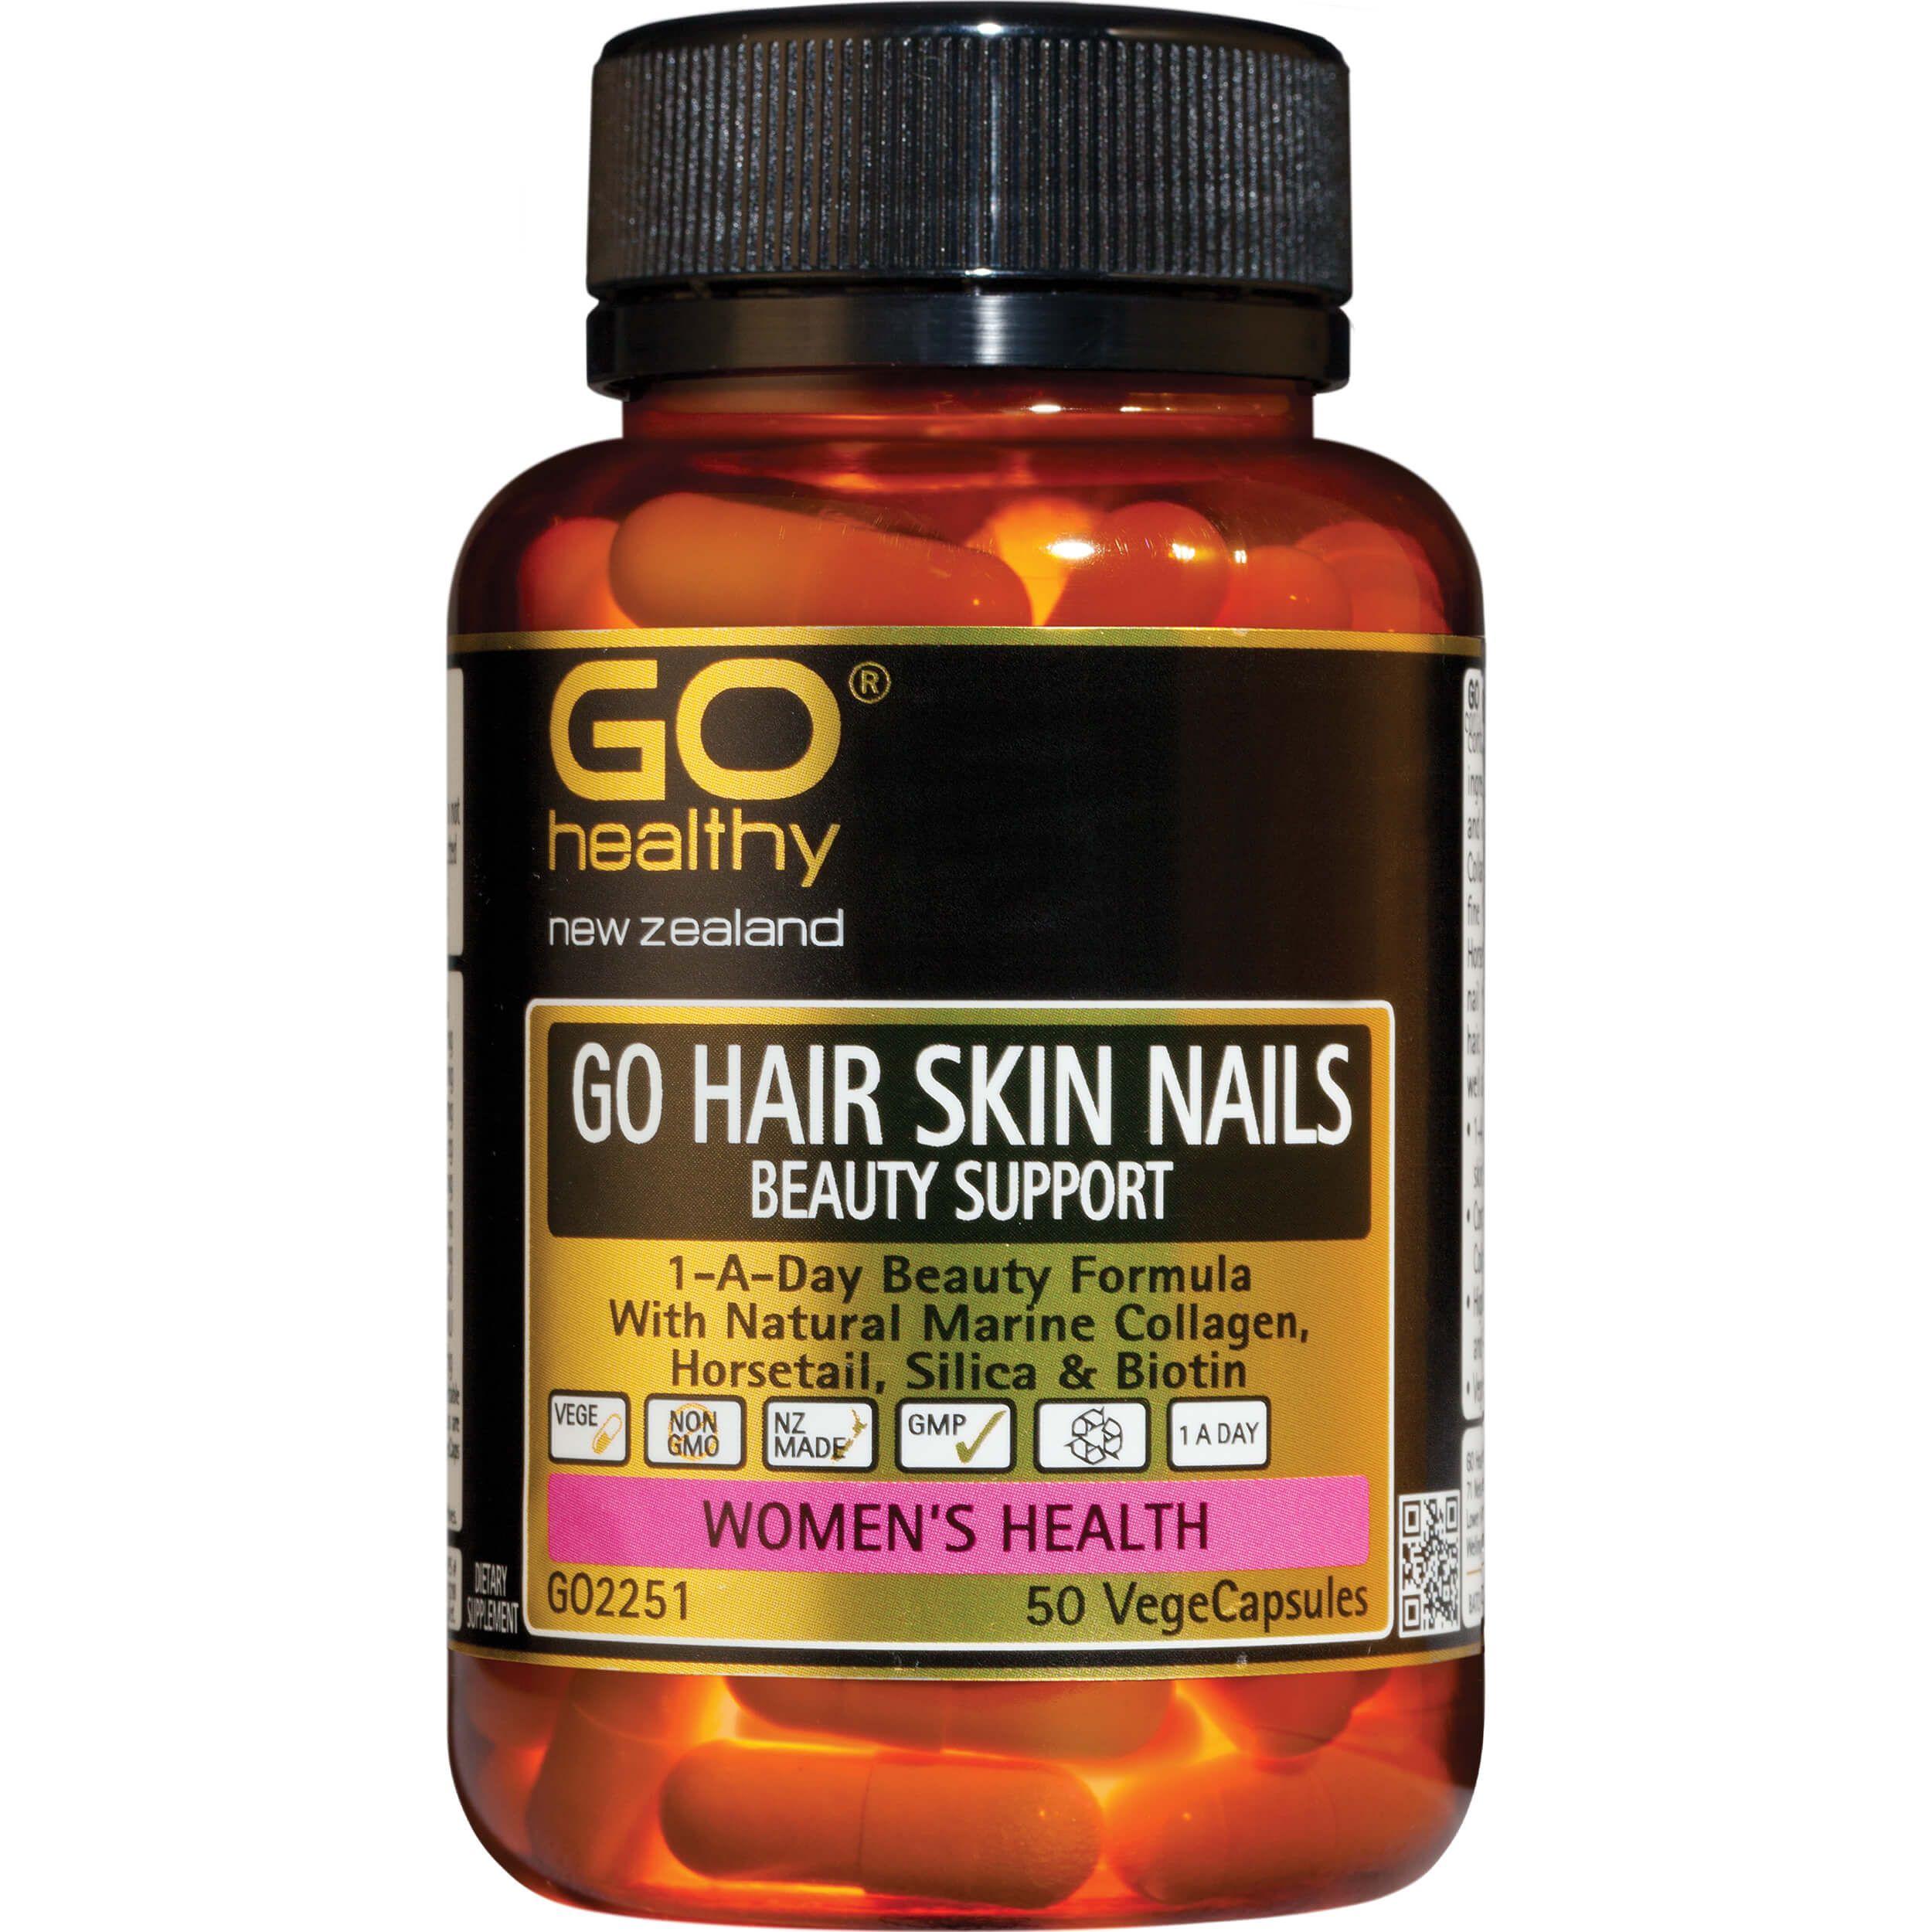 GO Healthy GO Hair Skin Nails Beauty Support VegeCapsules